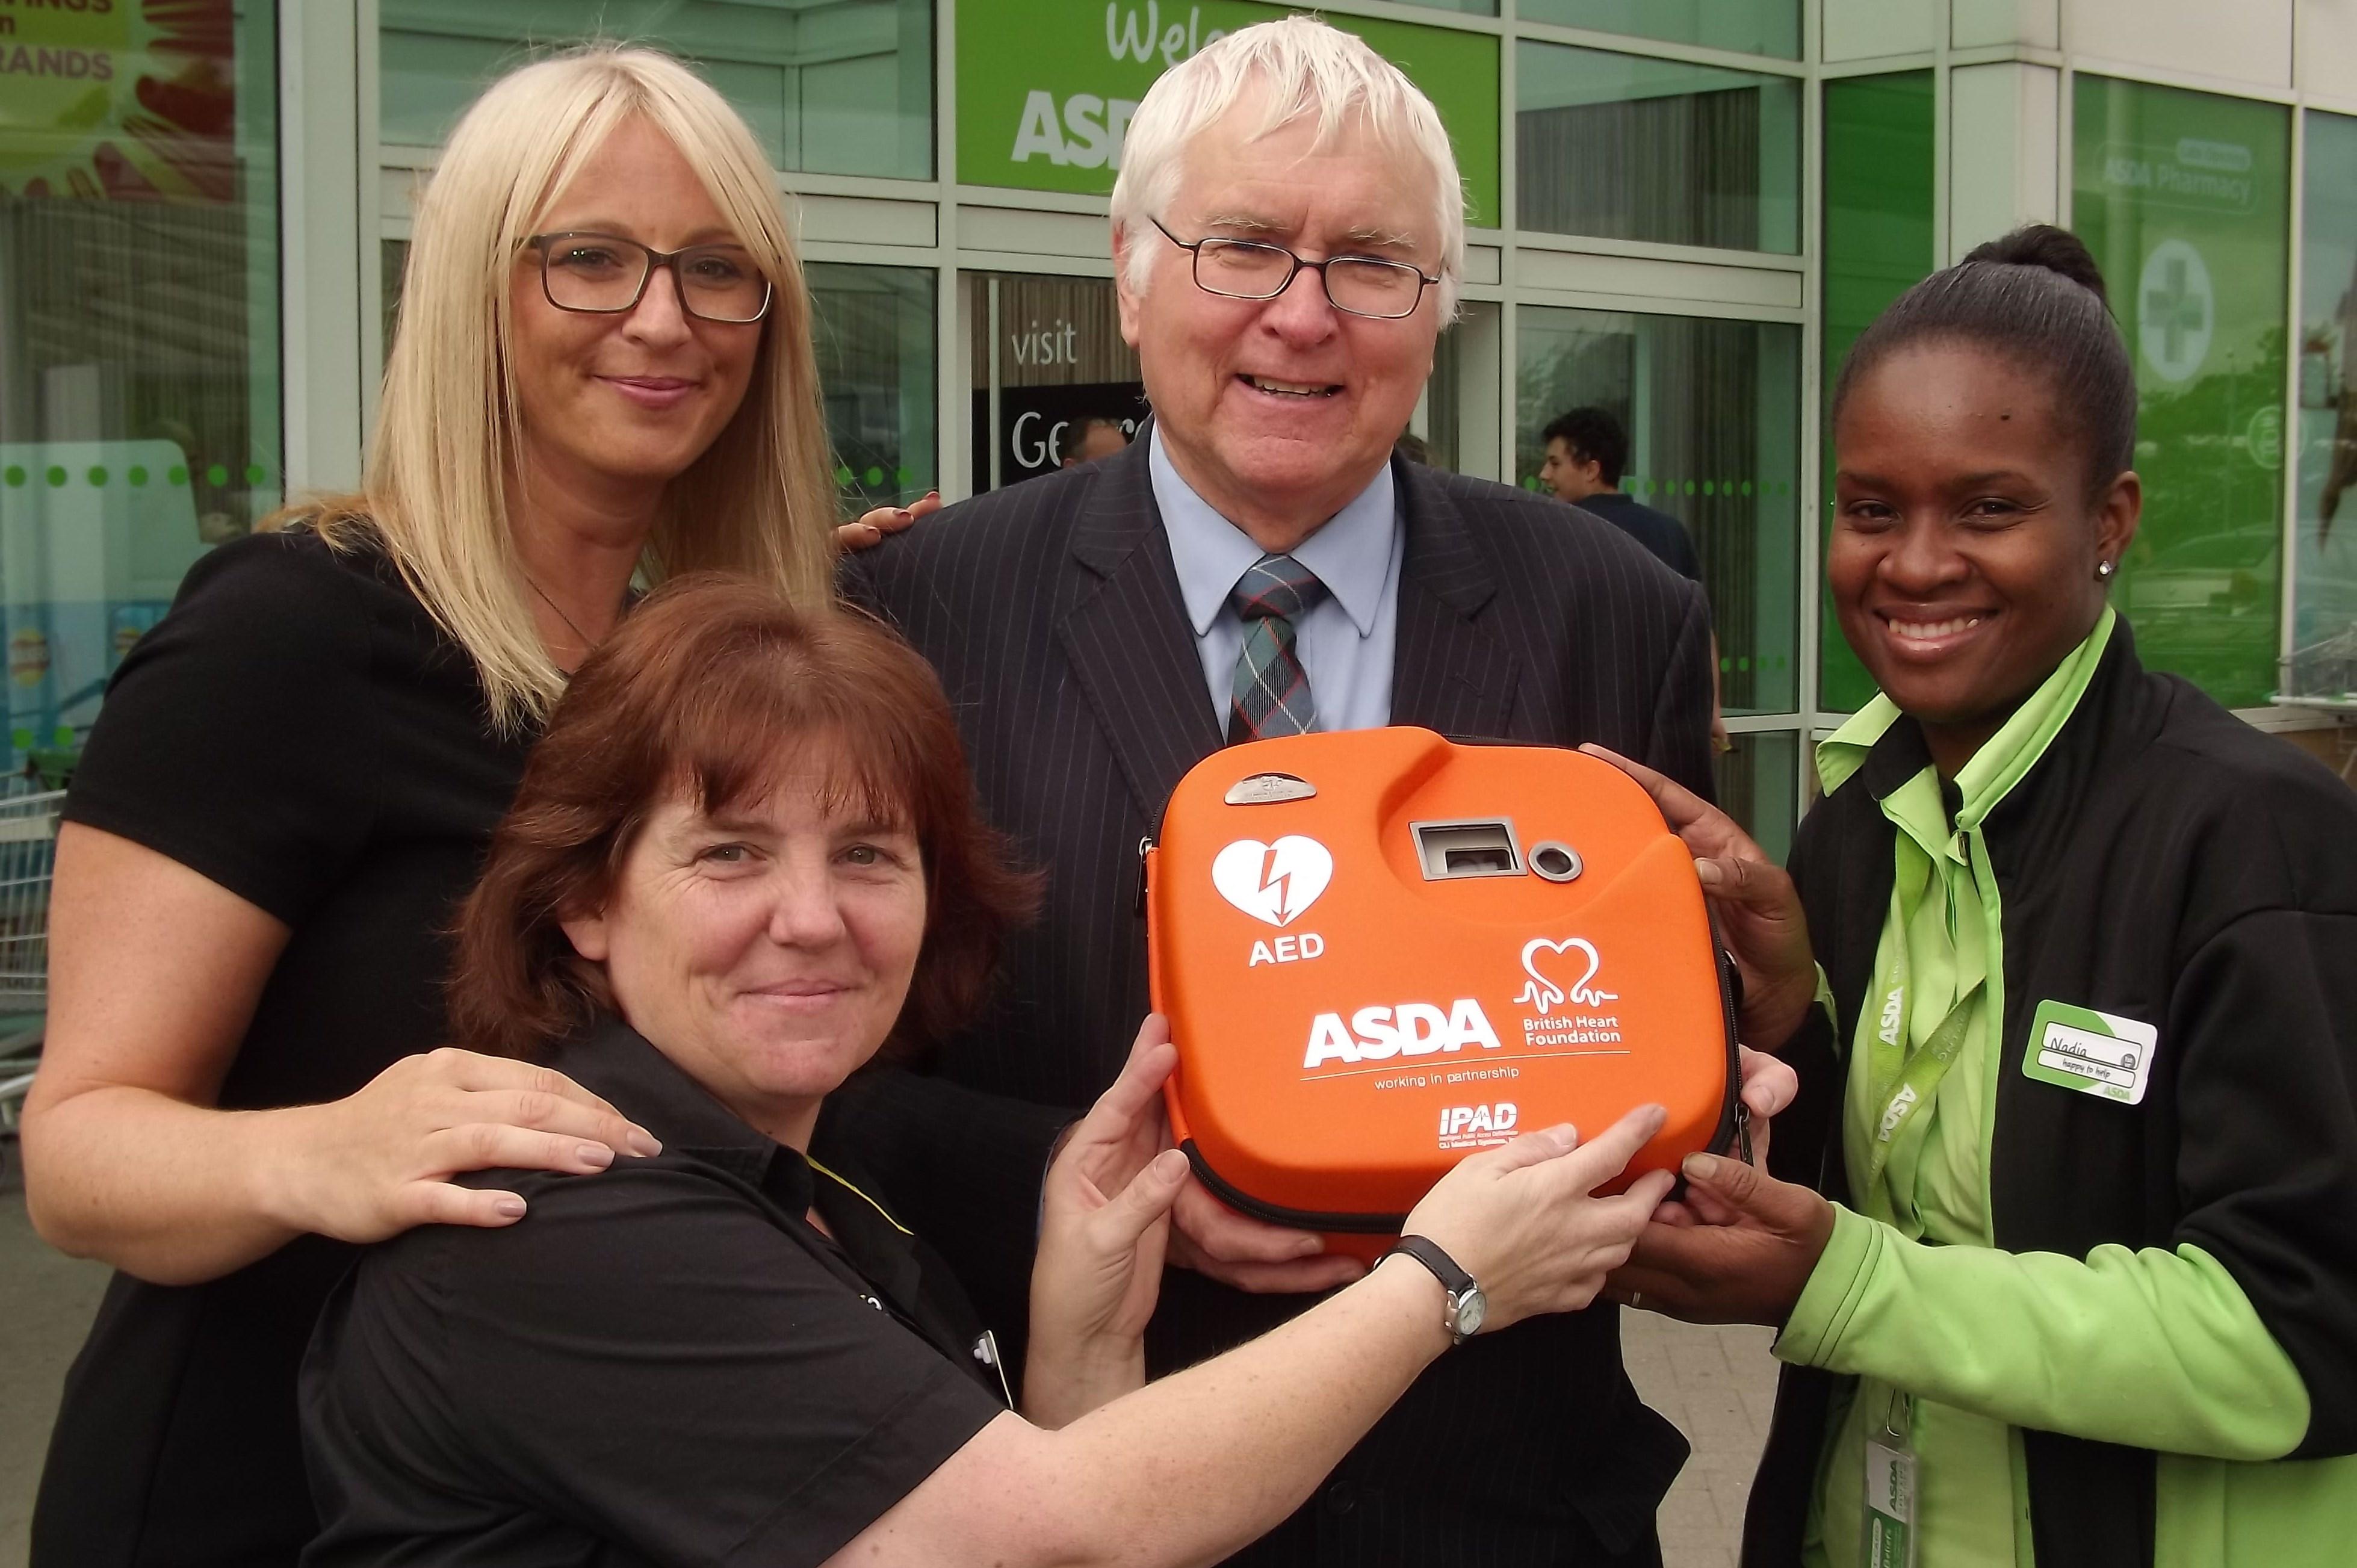 Bob_ASDA_defibrillator_1.JPG